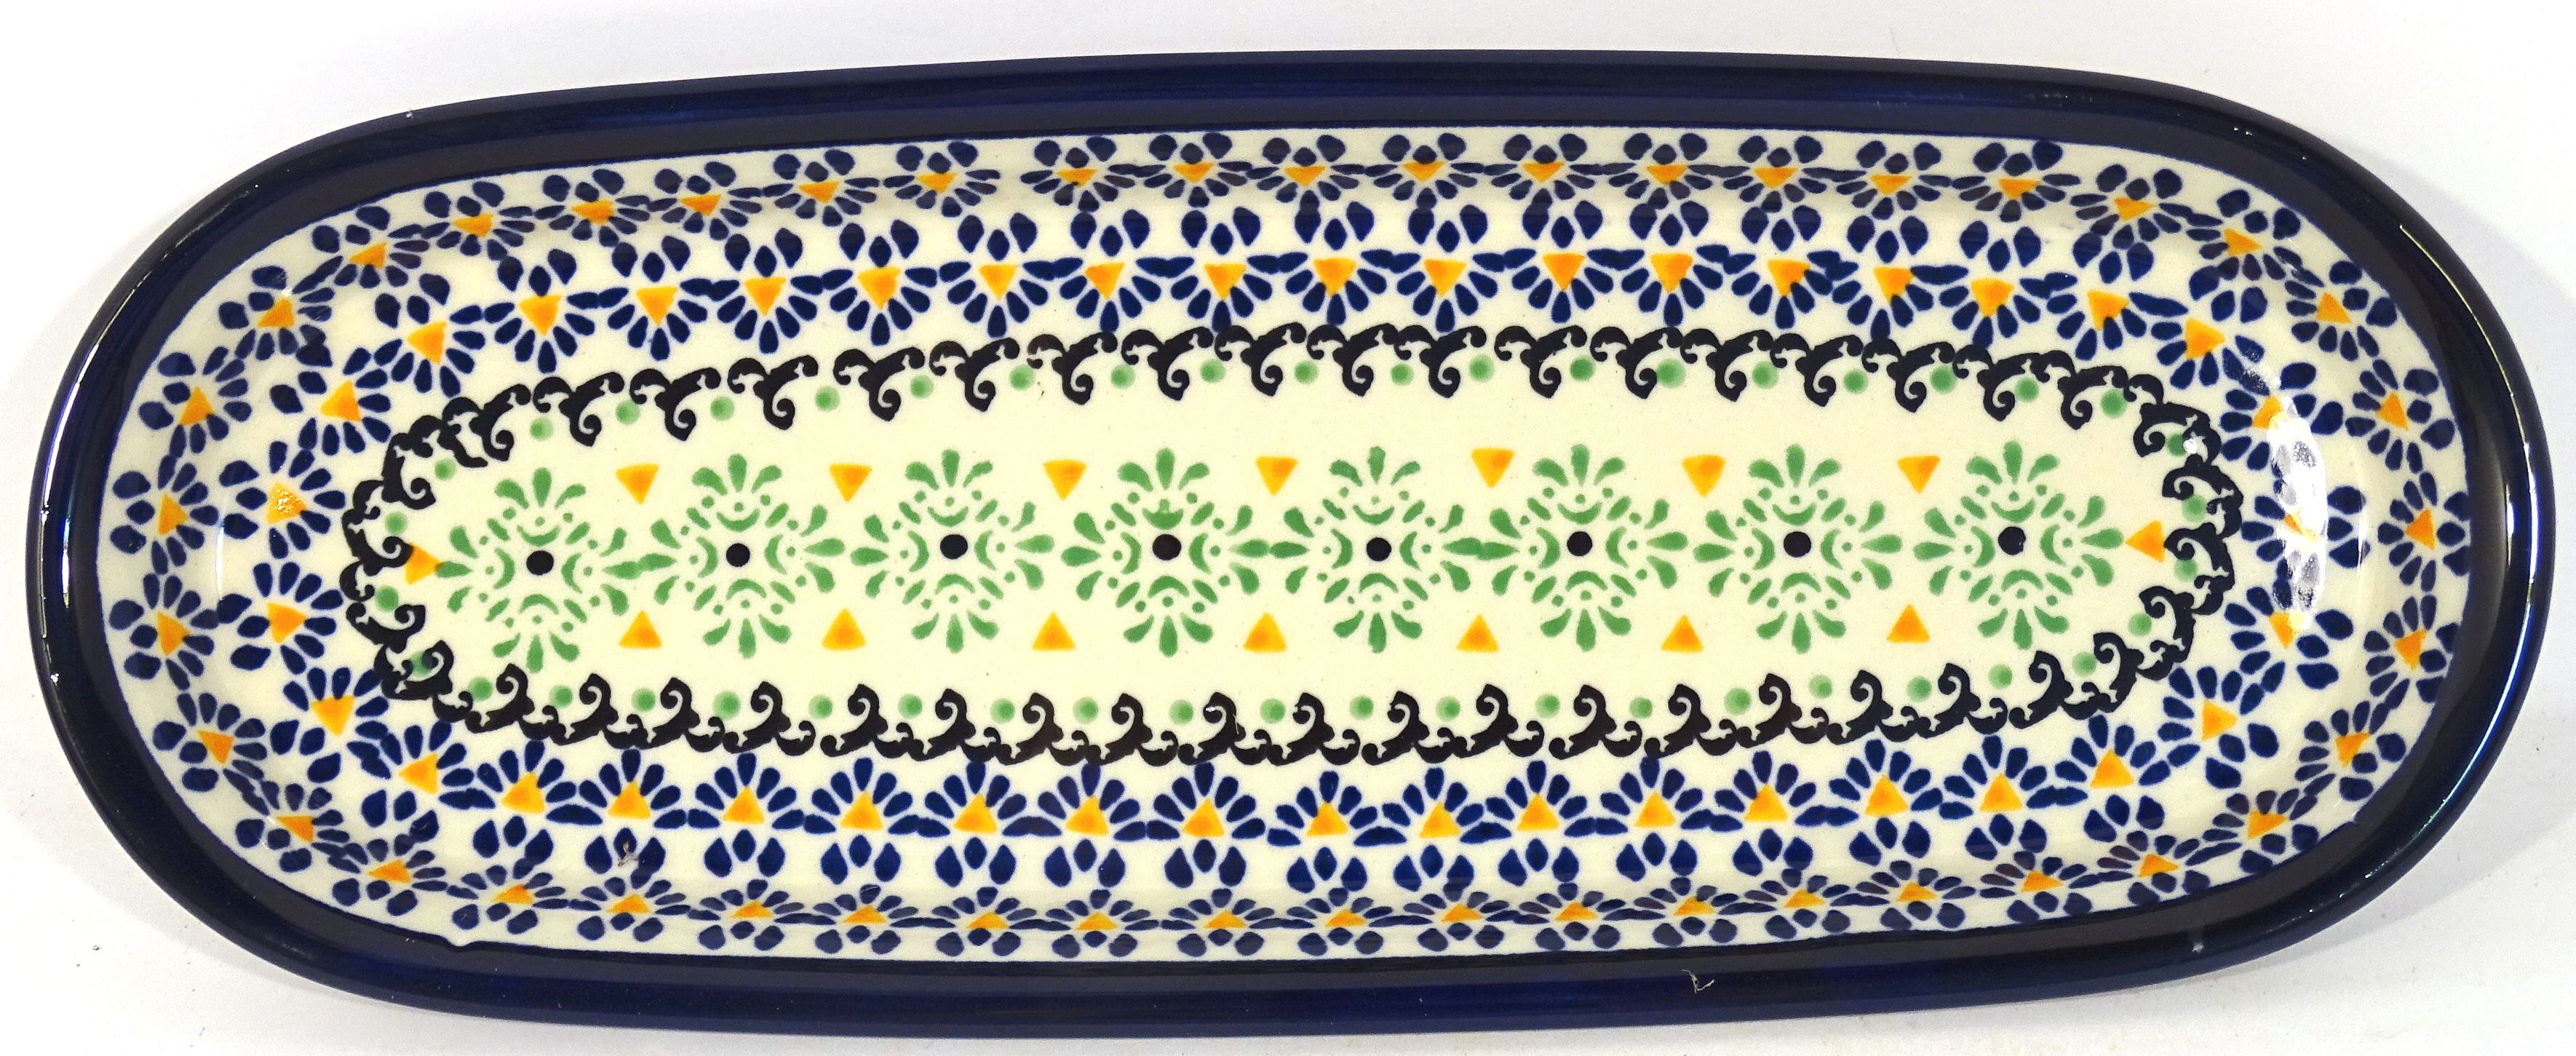 "Pottery Avenue 11"" Cracker-Olive Tray | CLASSIC"